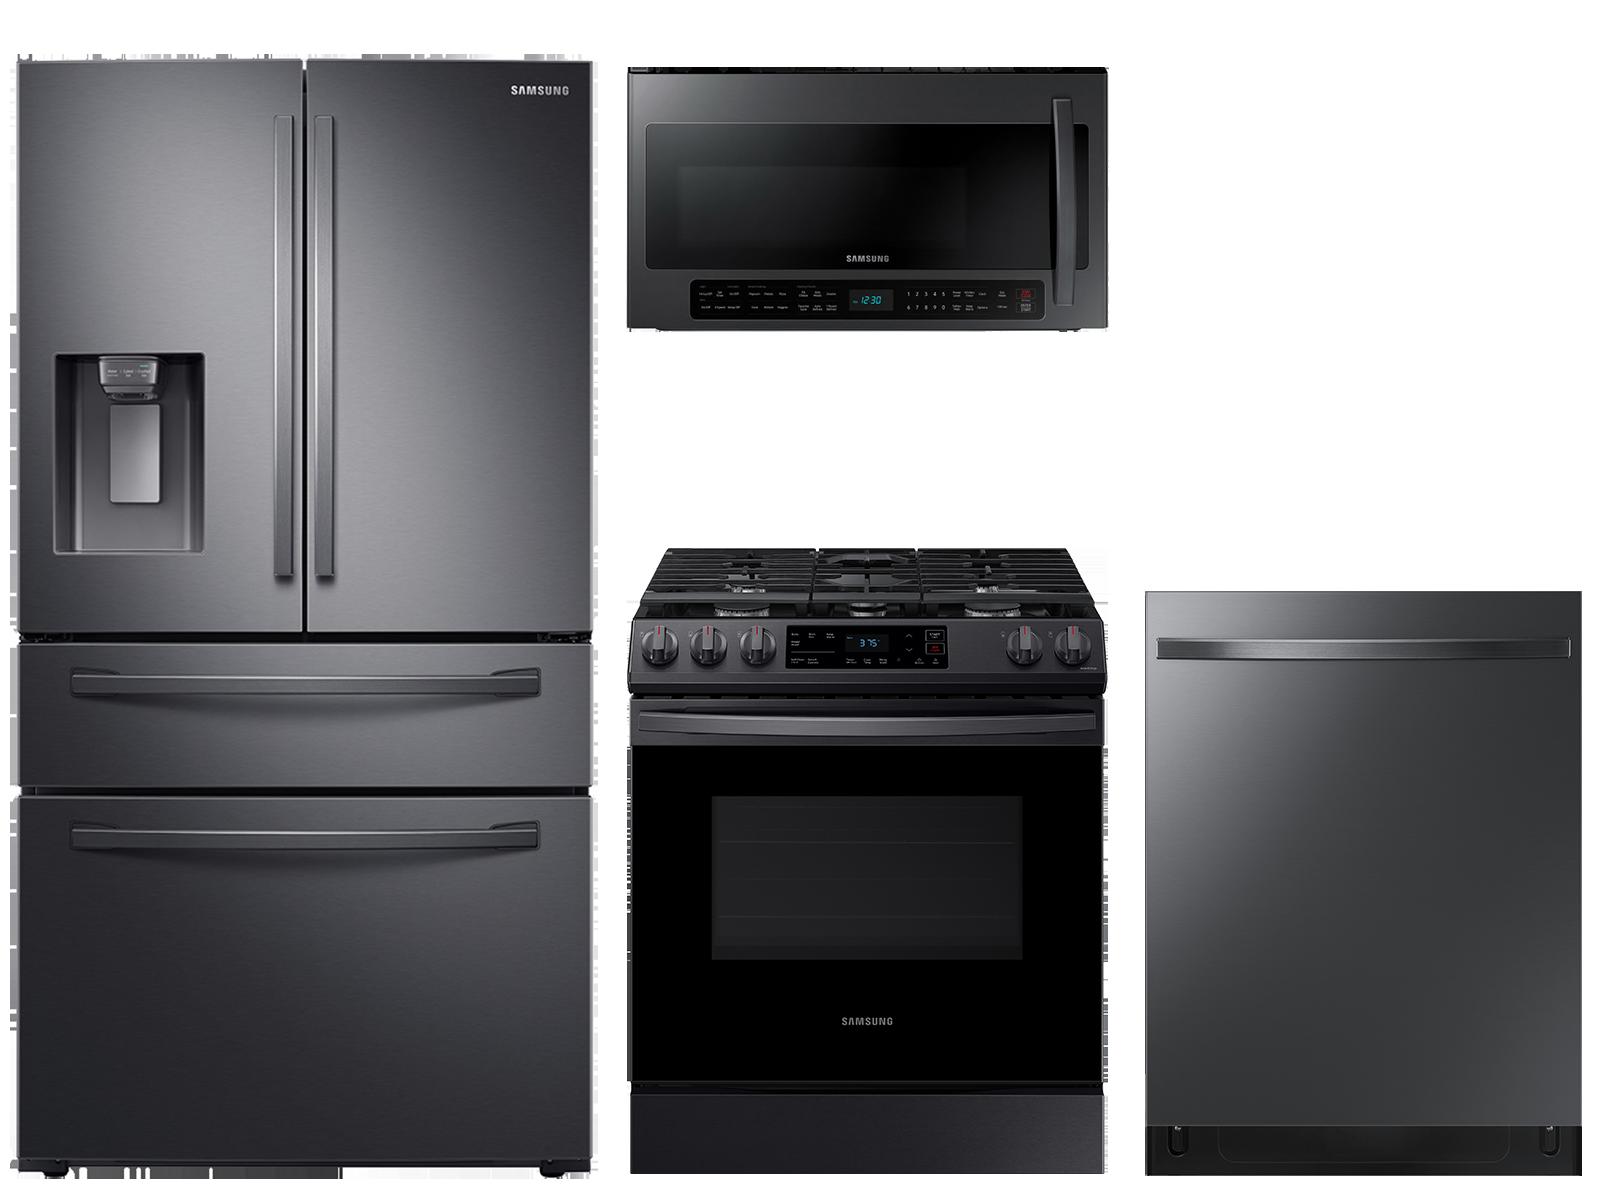 28 cu. ft. 4-door refrigerator, gas range, 2.1 cu. ft. microwave and 48 dBA modern-look dishwasher package